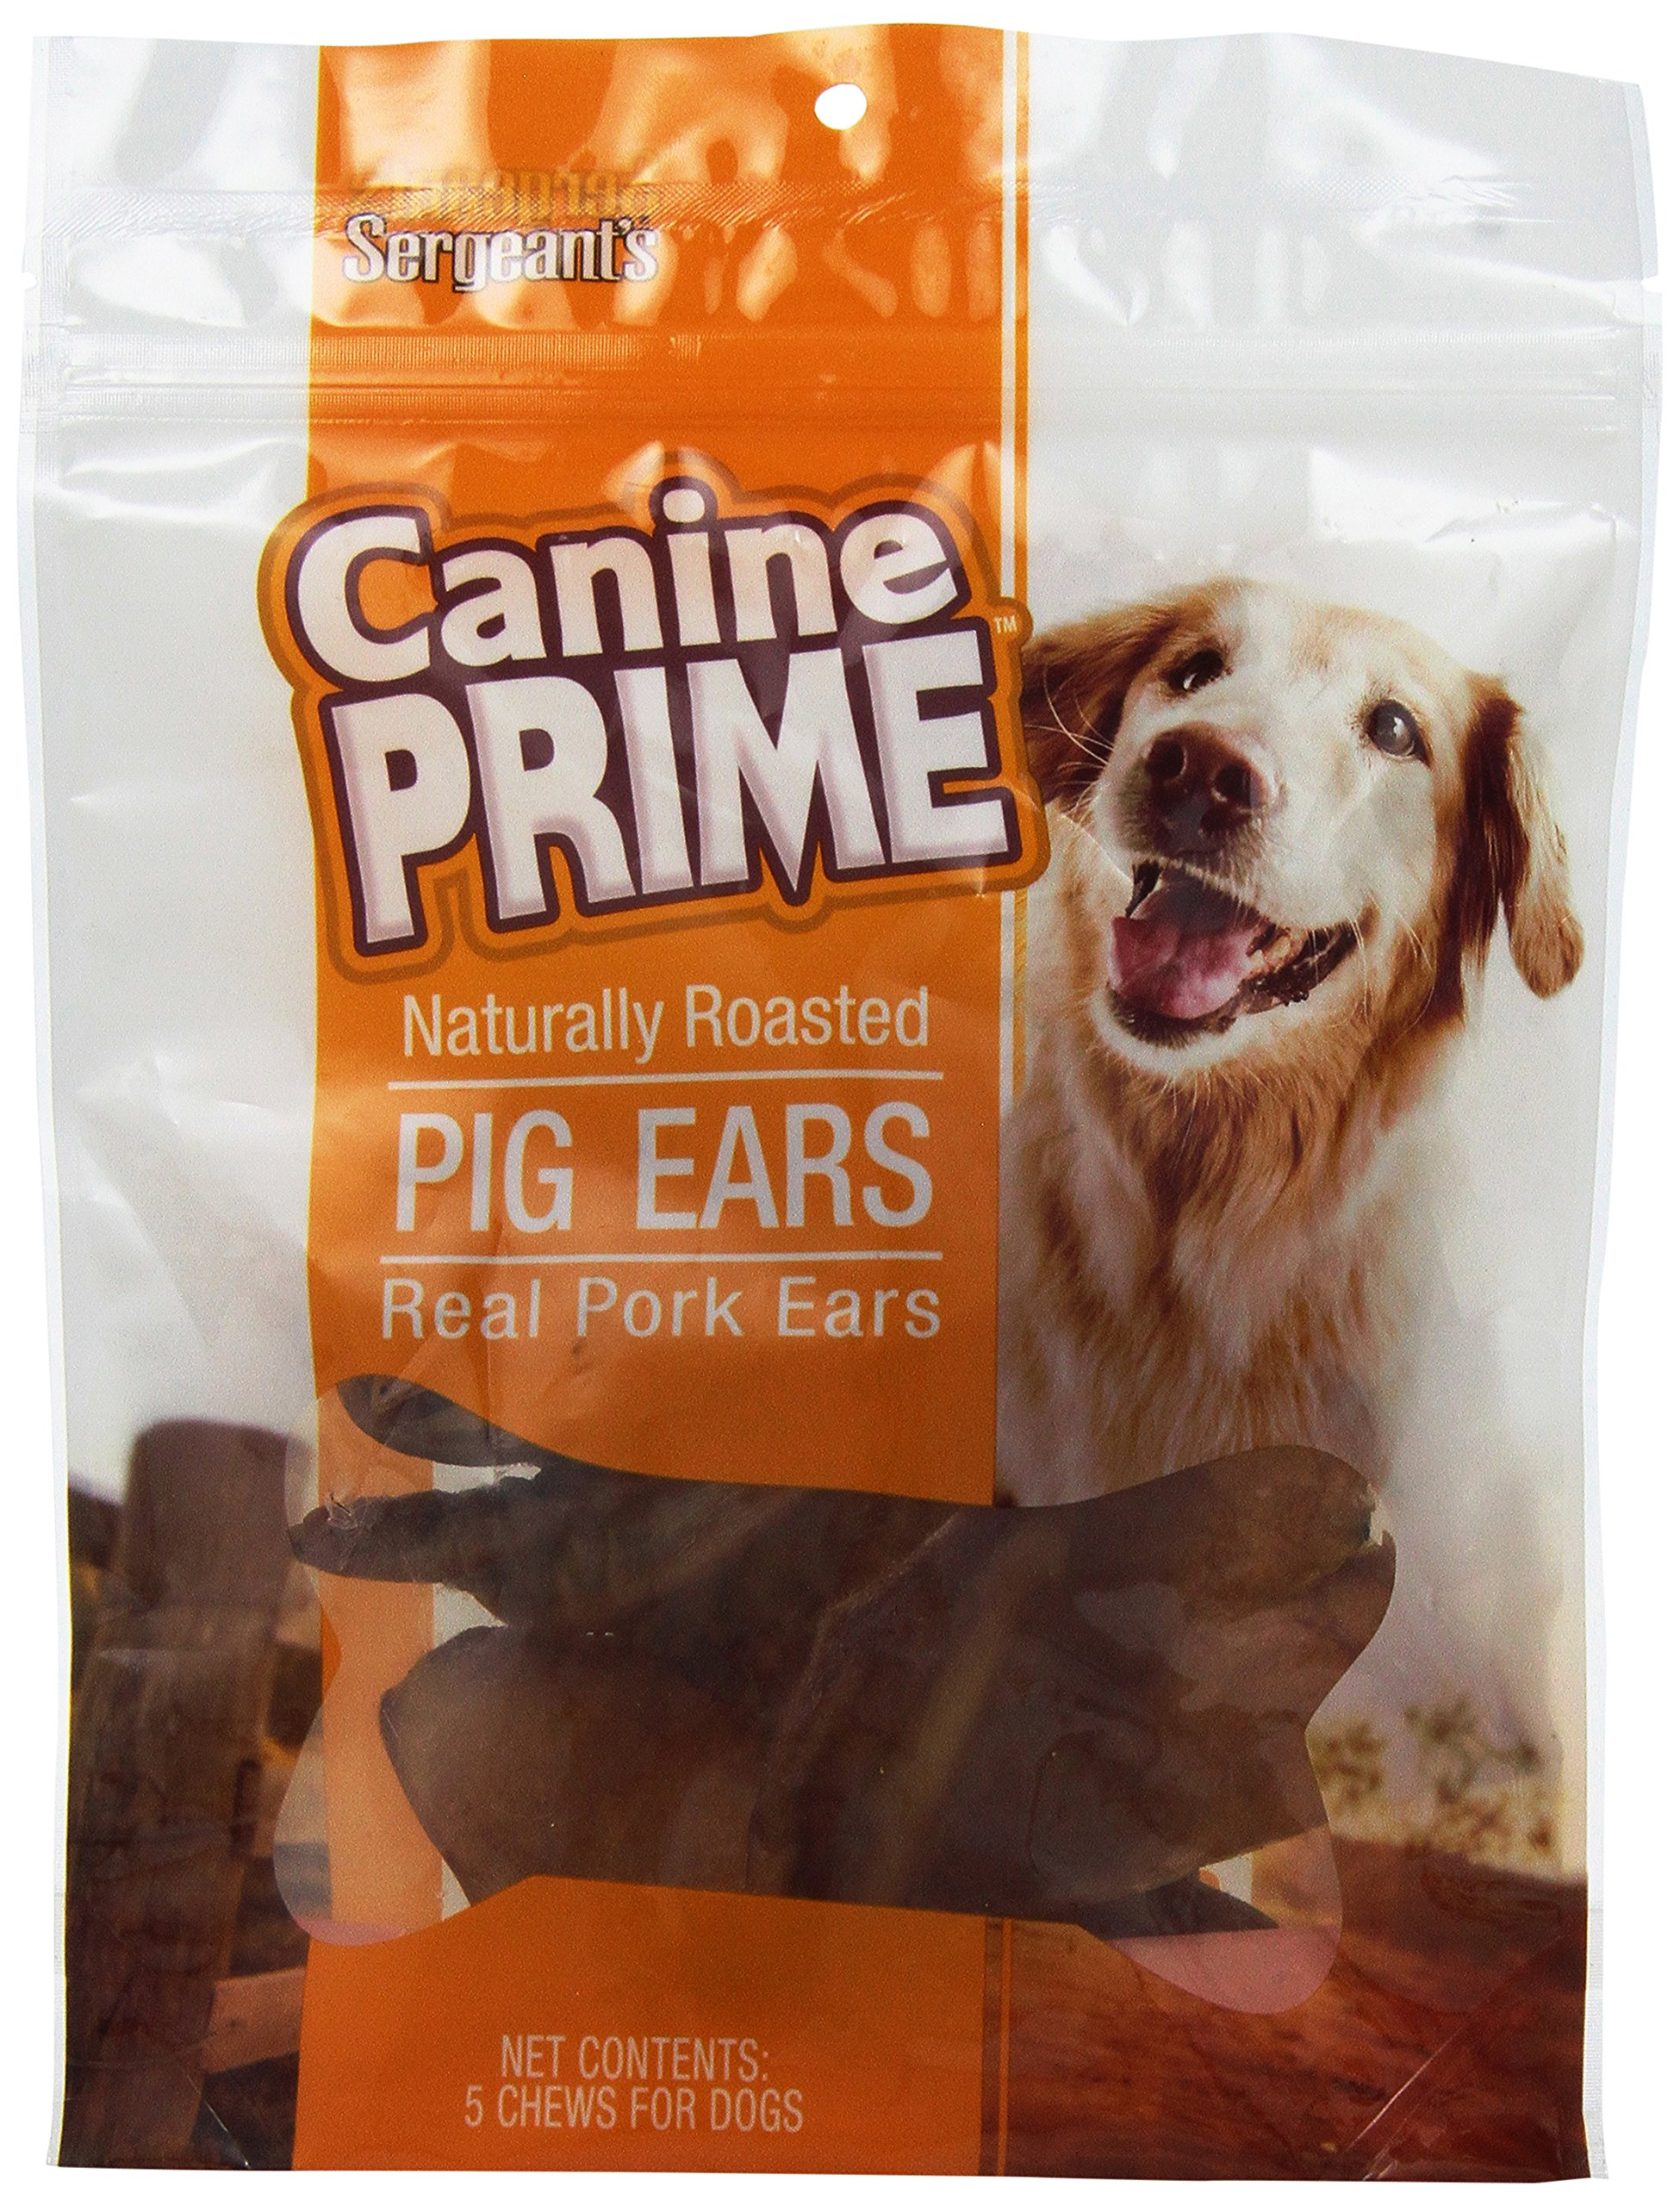 Sergeant's Pig Ear Halves 5-Count Dog Treat